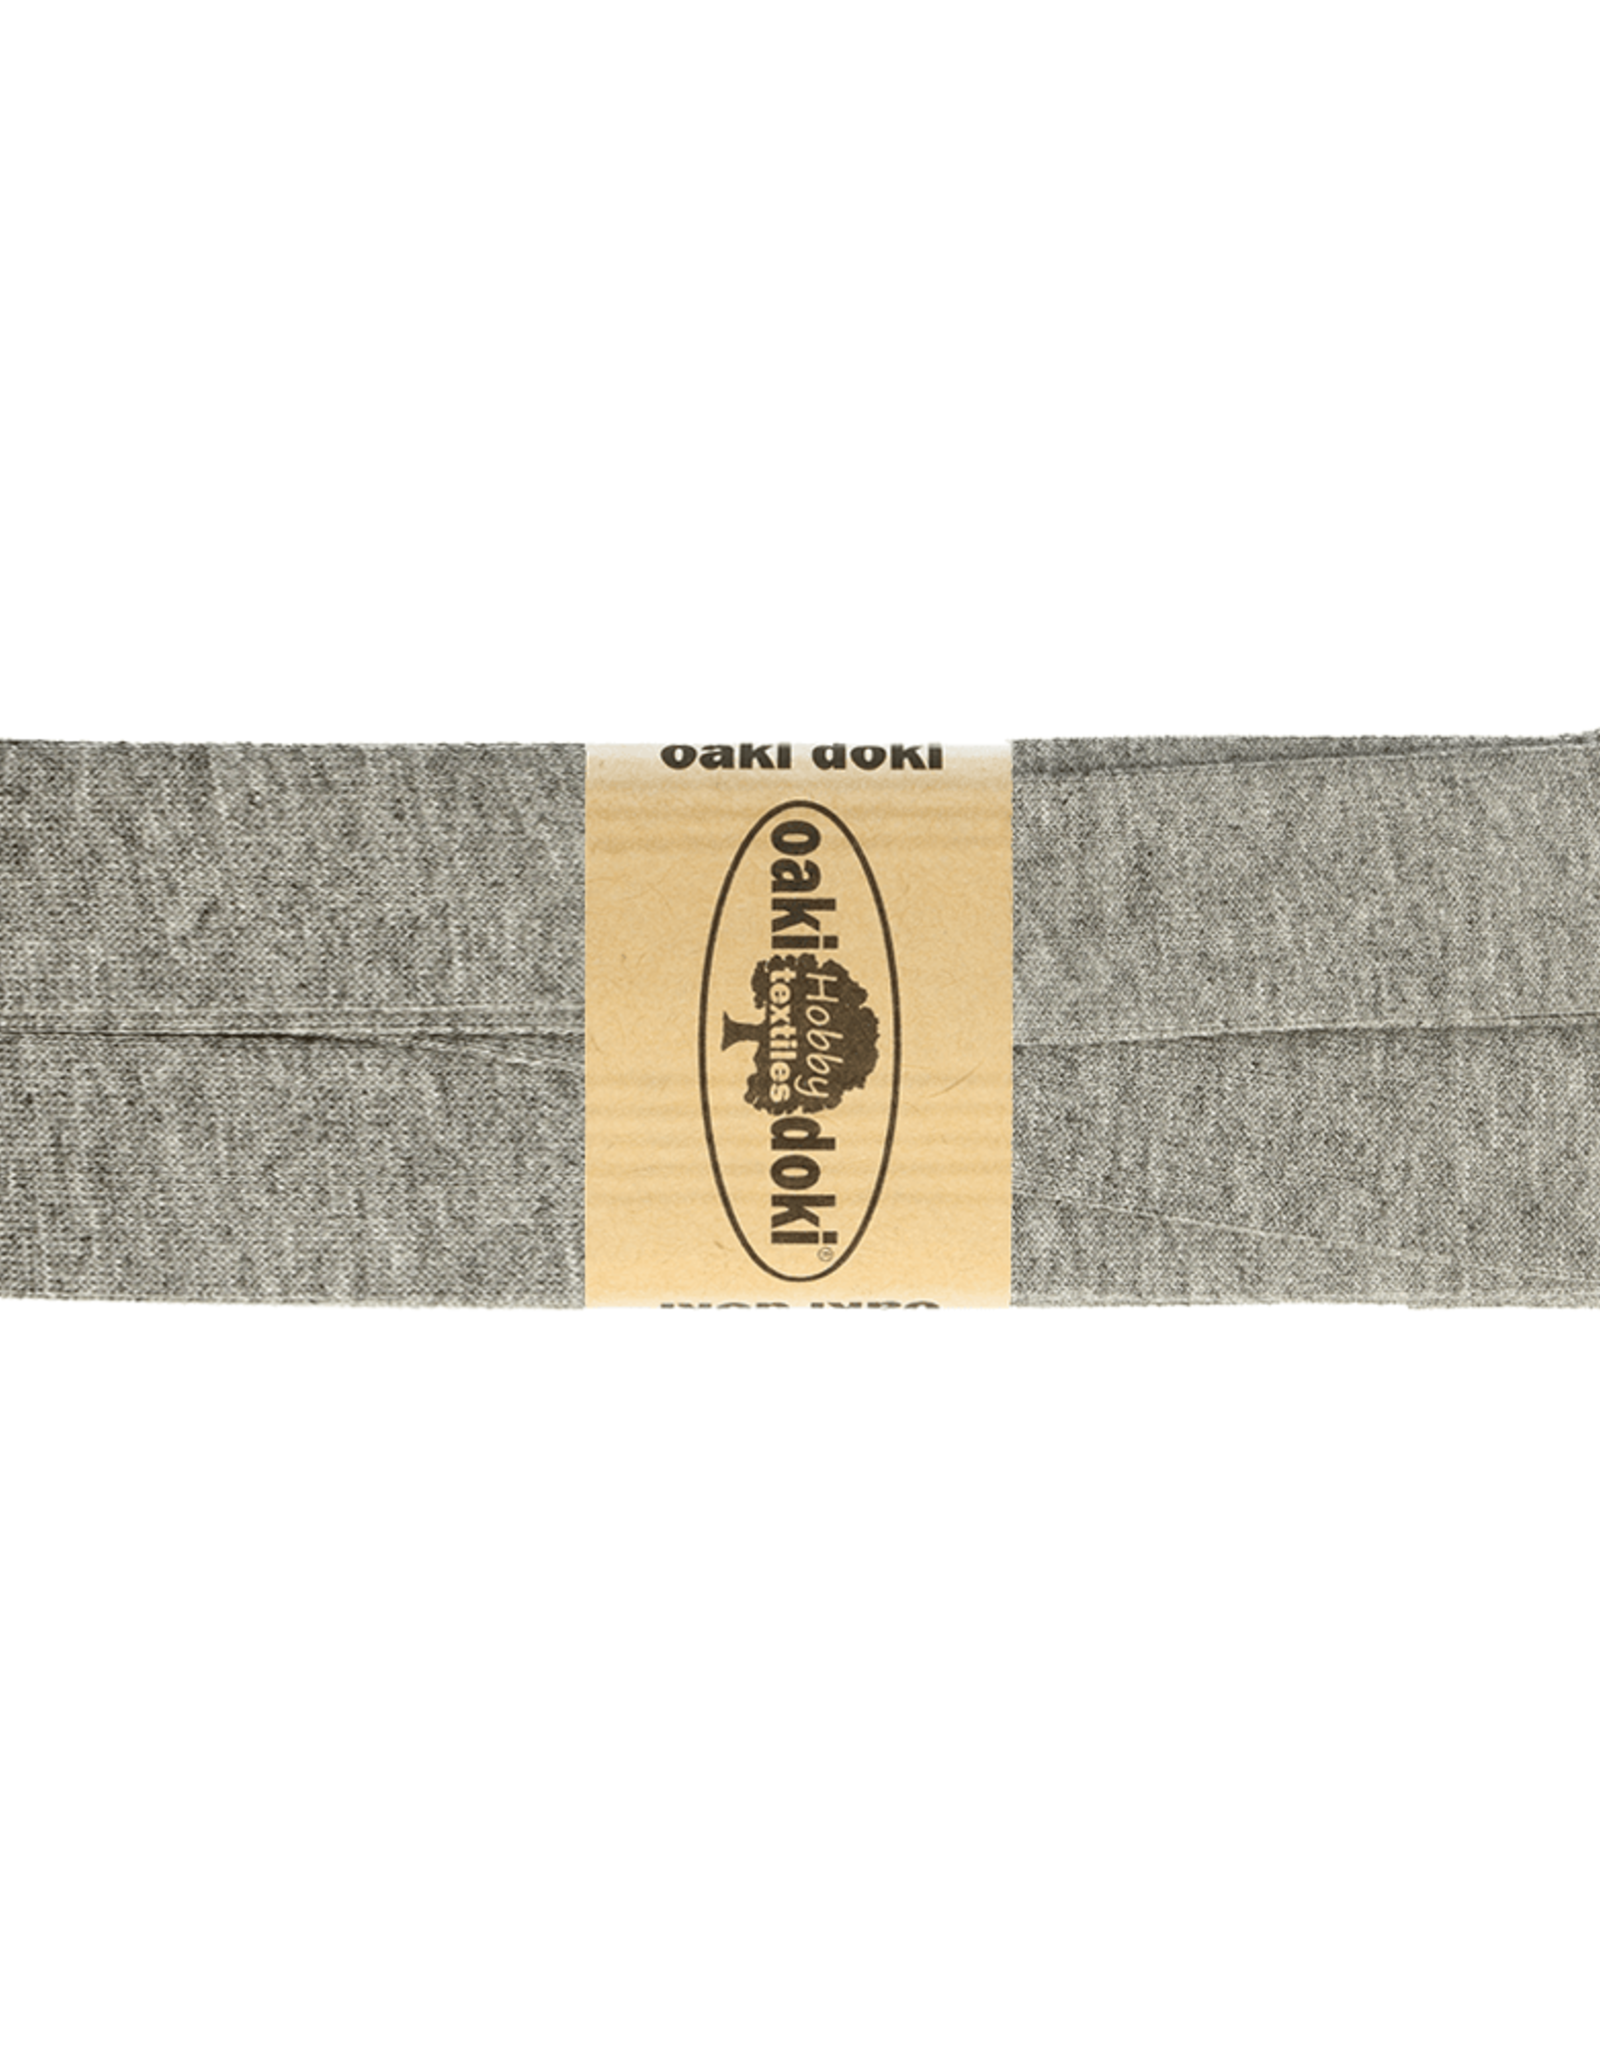 Oaki Doki Tricot de luxe jersey biaisband 20mm x 3m 067